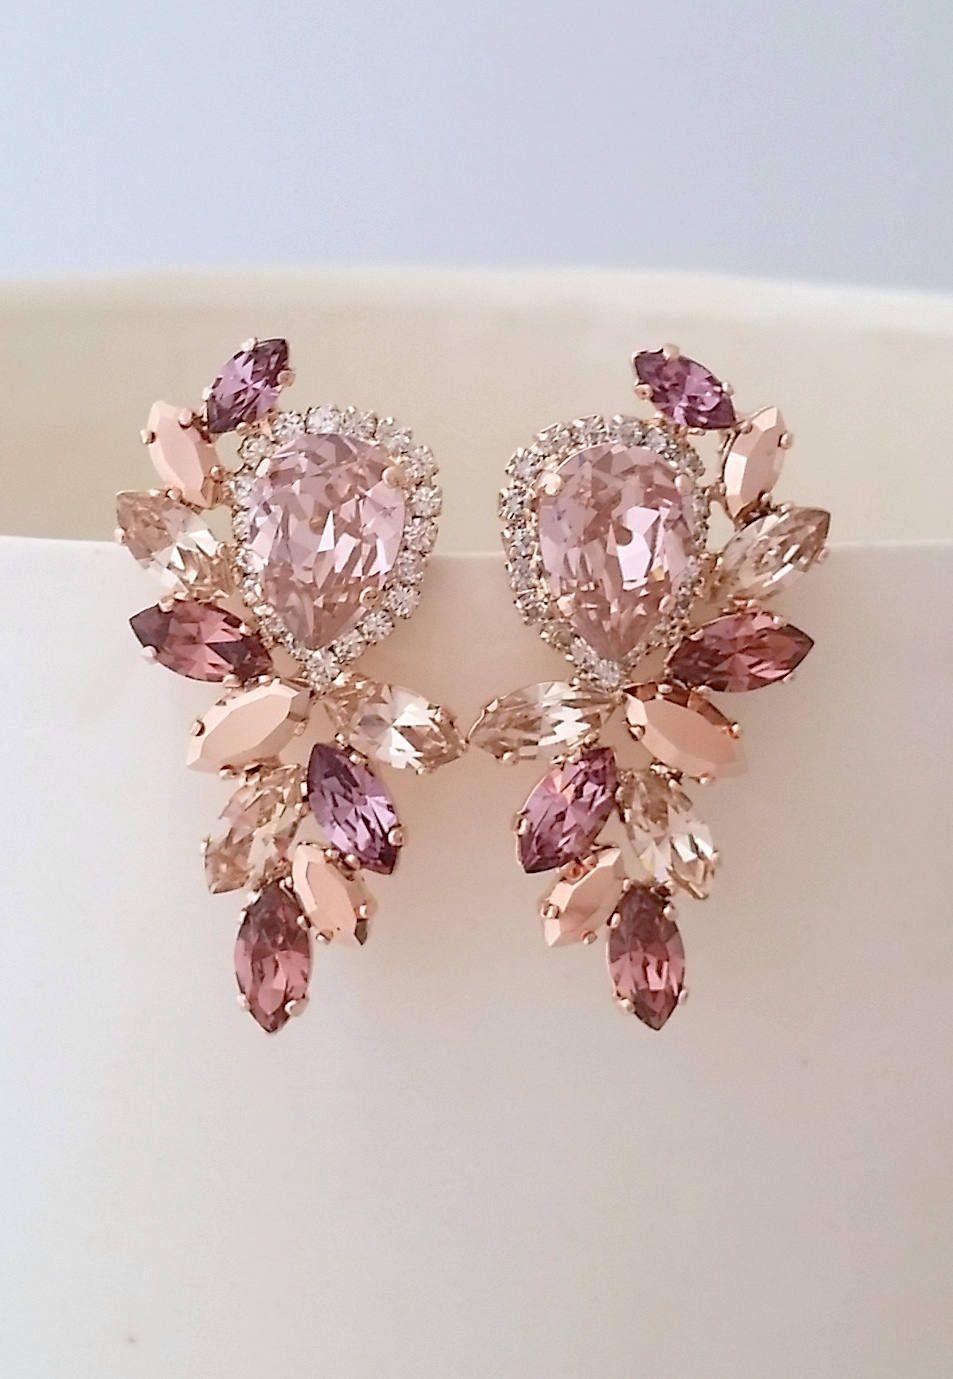 Blush Earringsmorganite Bridal Earringsrose Gold Etsy Blush Earrings Rose Gold Bridal Earrings Large Stud Earrings